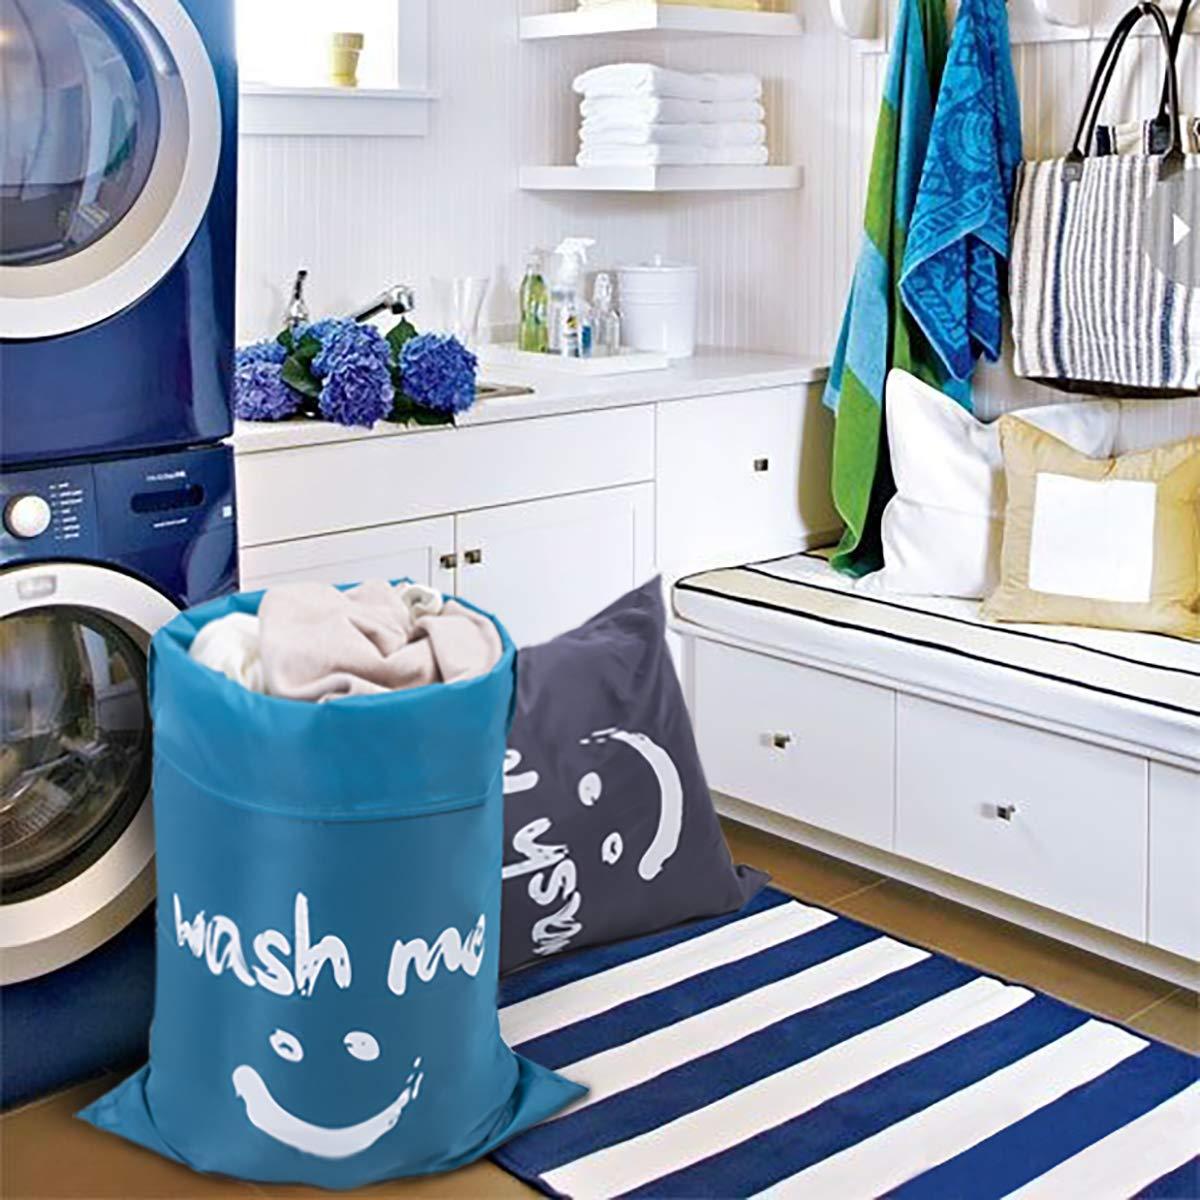 ZERO JET LAG 2 Pack Extra Large Travel Laundry Bag Set Nylon Rip-Stop Dirty Storage Bag Machine Washable Drawstring Closure 24'' x 36'' (Blue and Gray) by ZERO JET LAG (Image #8)